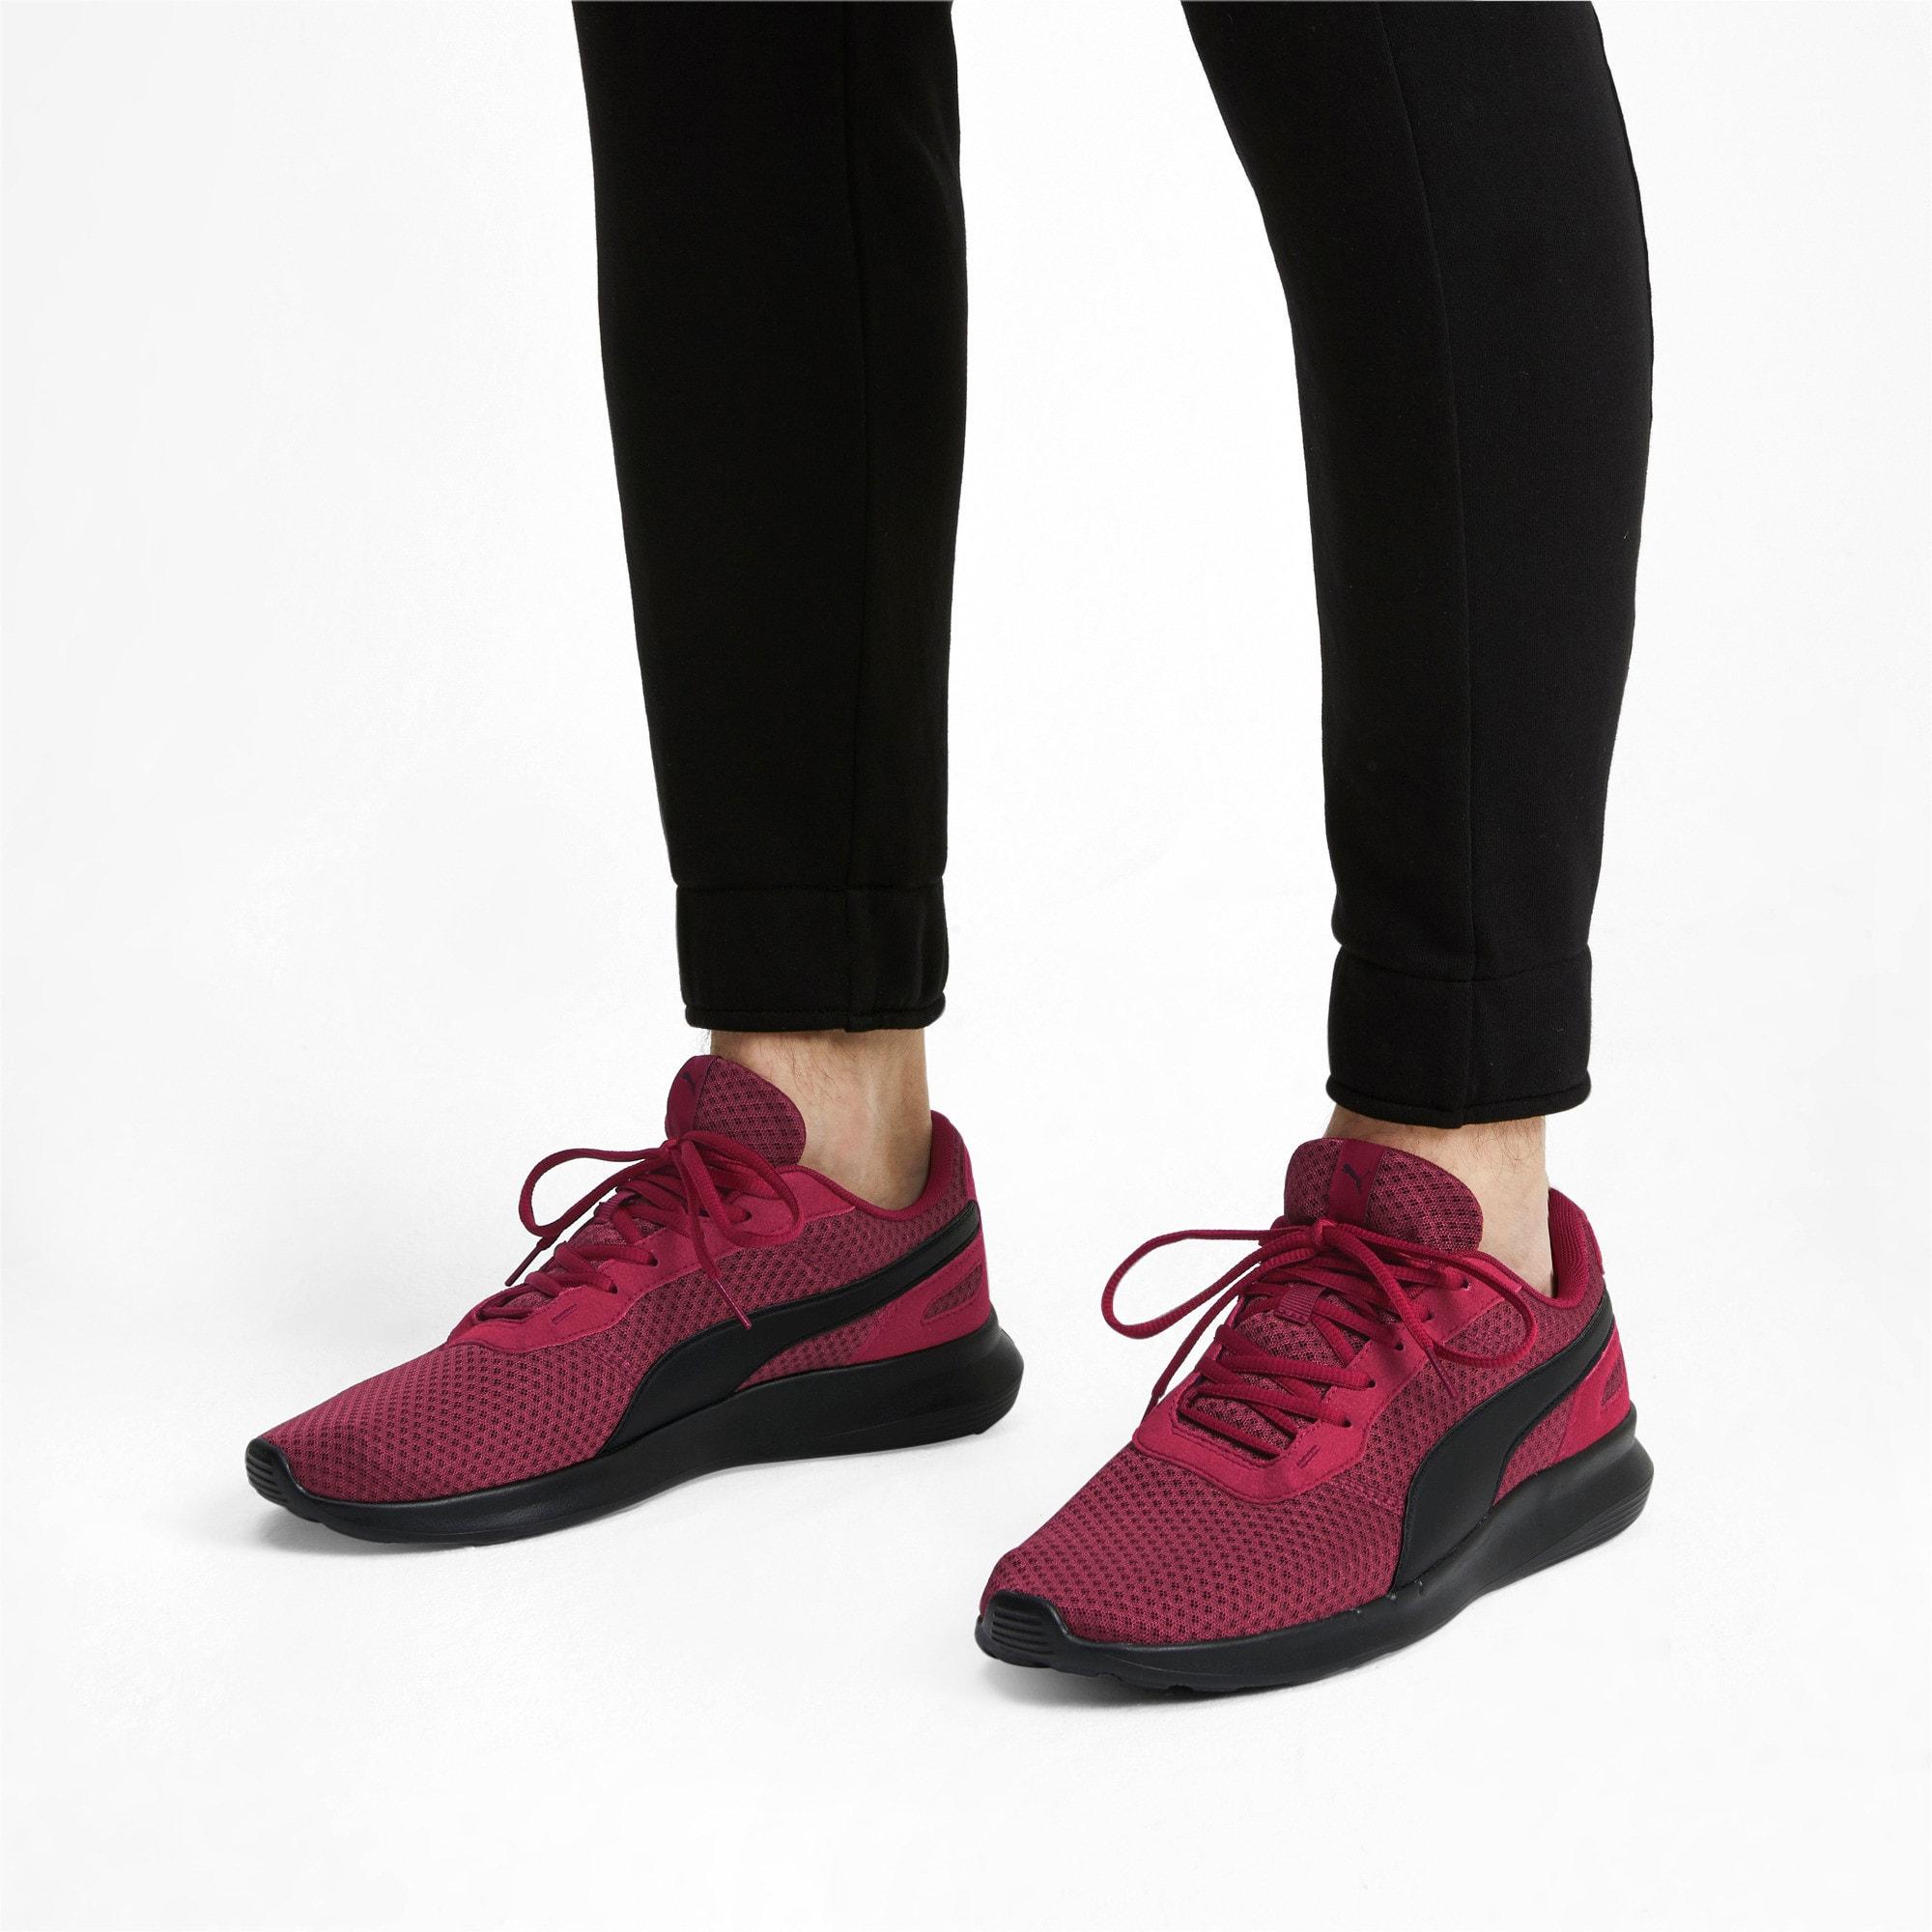 Thumbnail 3 of ST Activate Sneakers, Rhubarb-Puma Black, medium